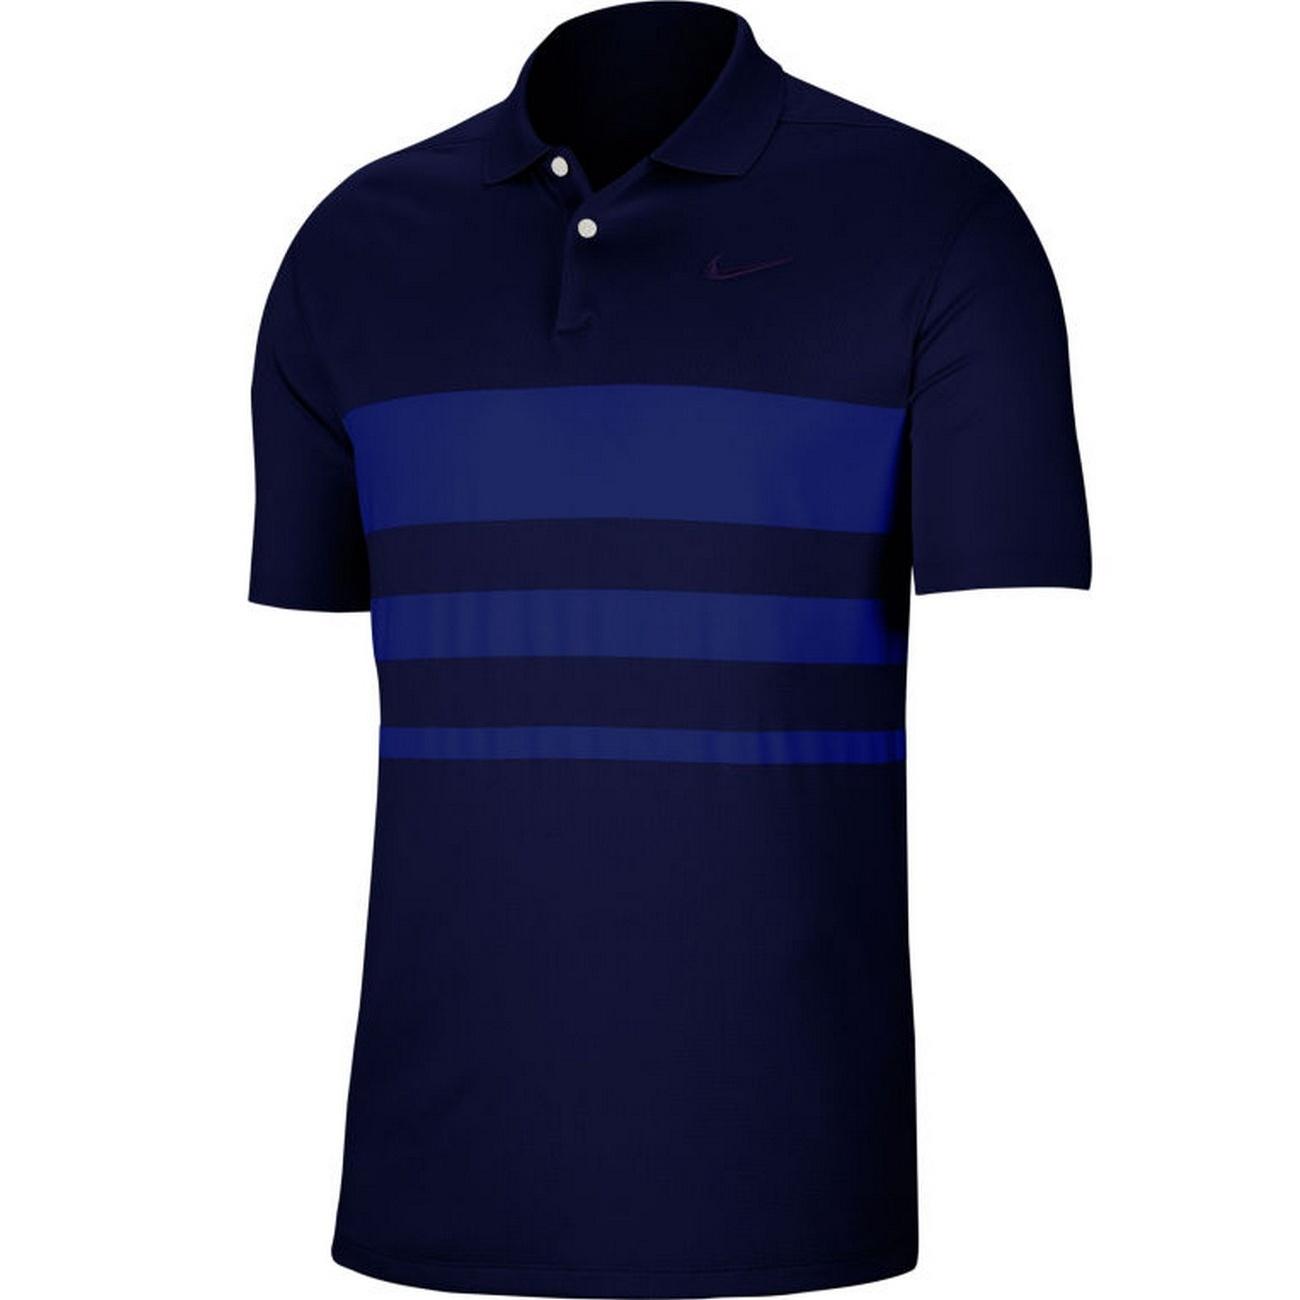 Nike Mens Vapour Striped Polo Shirt (L) (Navy/Deep Royal Blue)